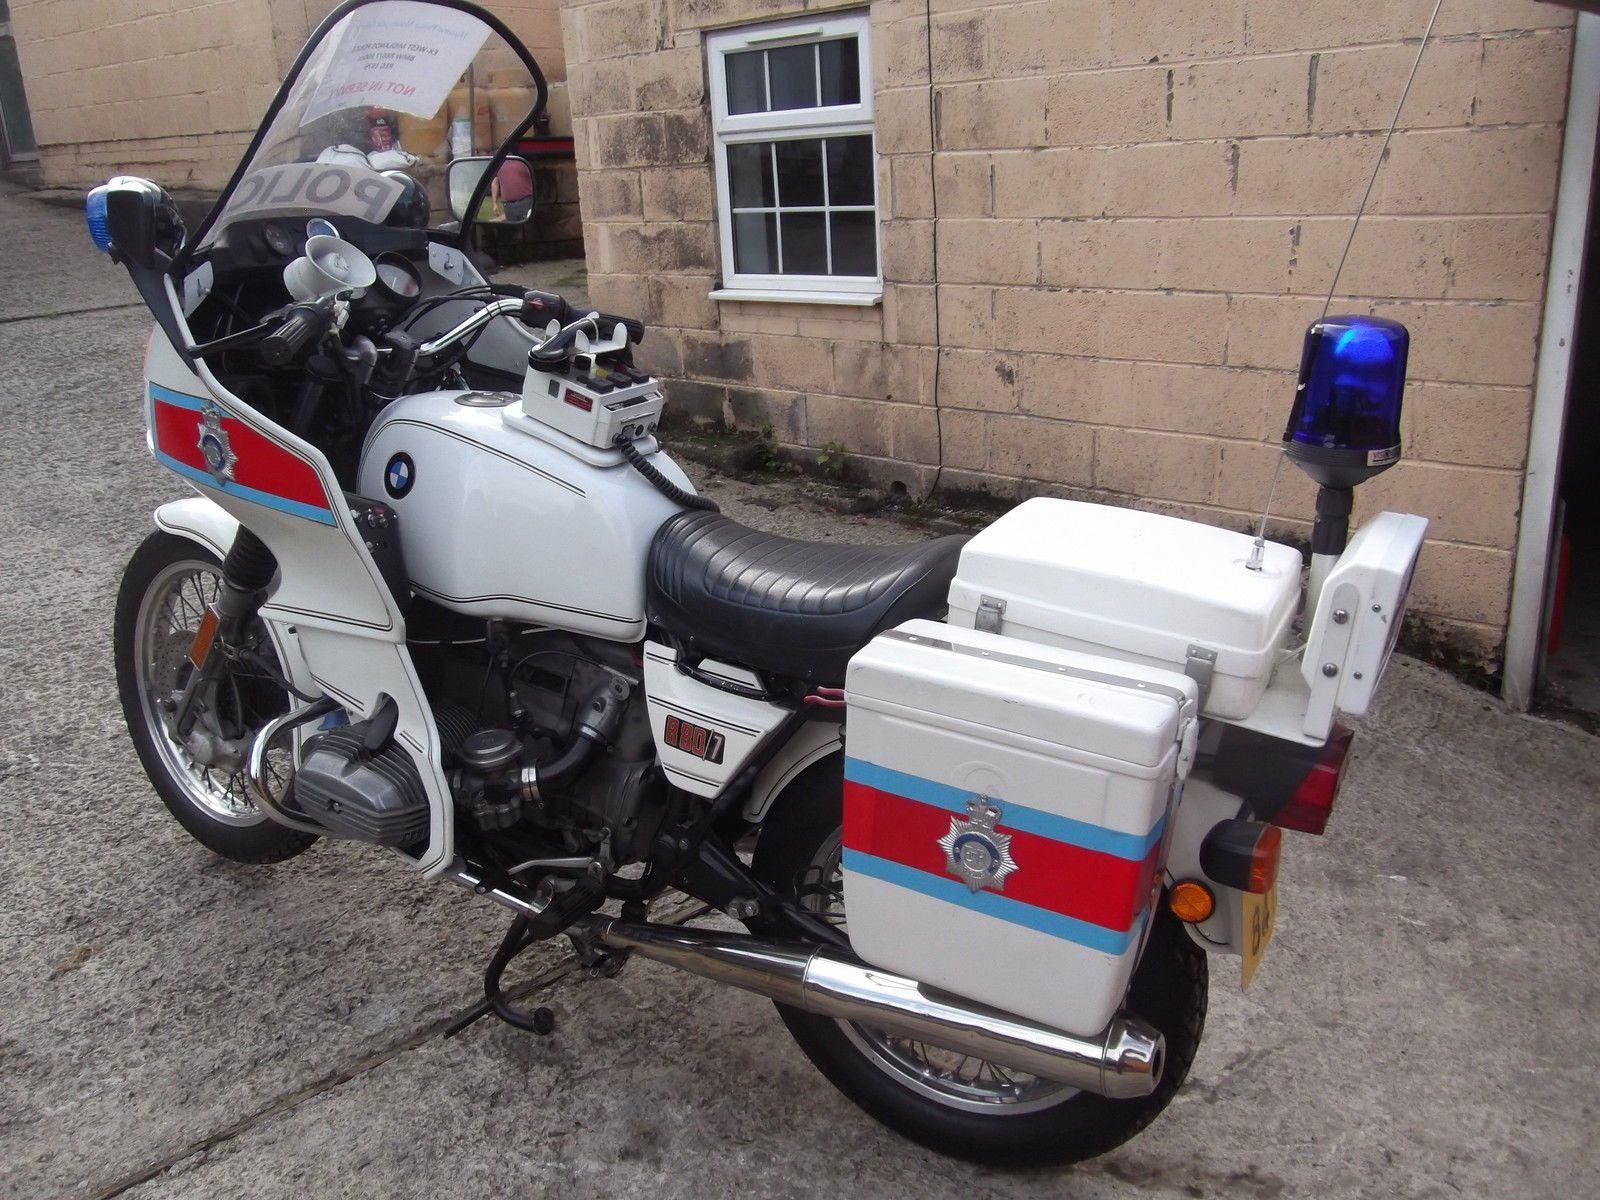 small resolution of 1979 bmw r80 ex police motorcycle 800cc restored good runner poss film work ebay